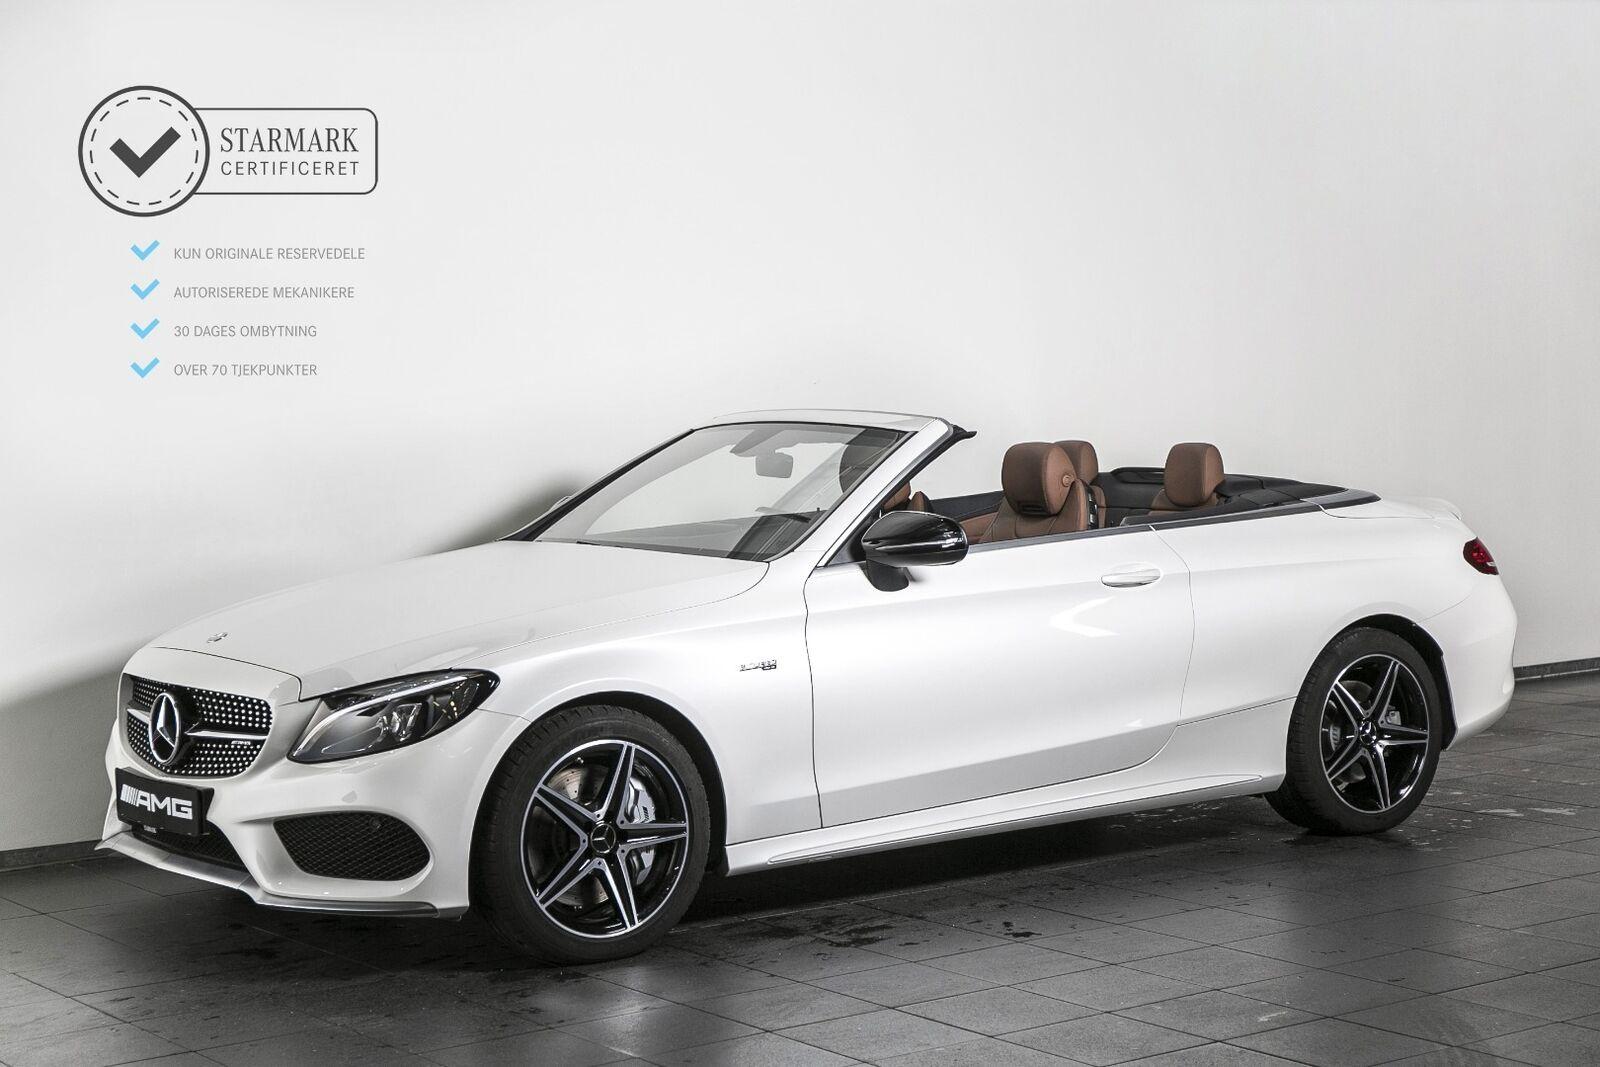 Mercedes-Benz C43 3,0 AMG Cabriolet aut. 4-M